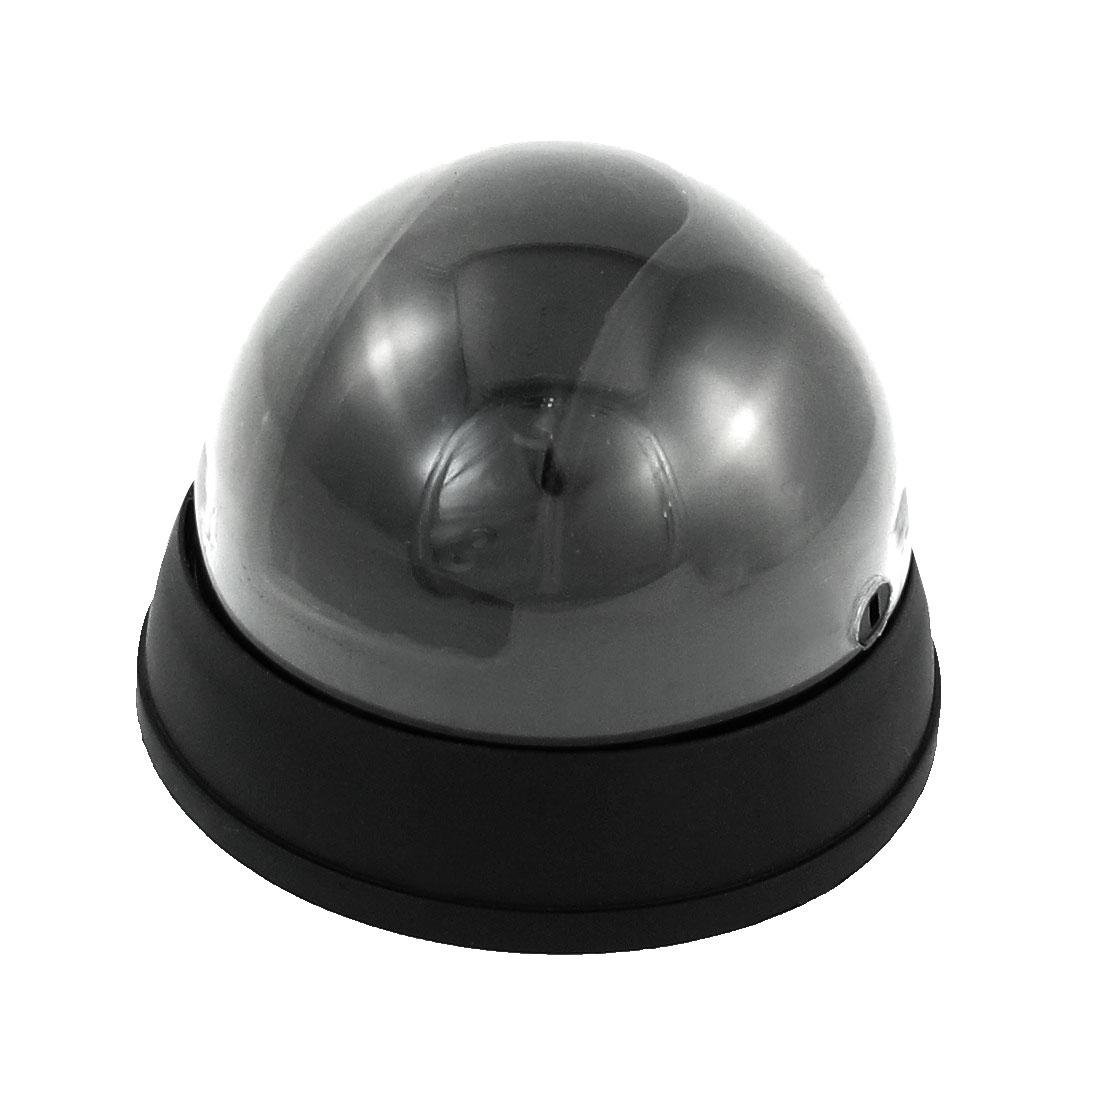 Fake Imitation Surveillance Security Dome Camera w Red Flashing Light LED